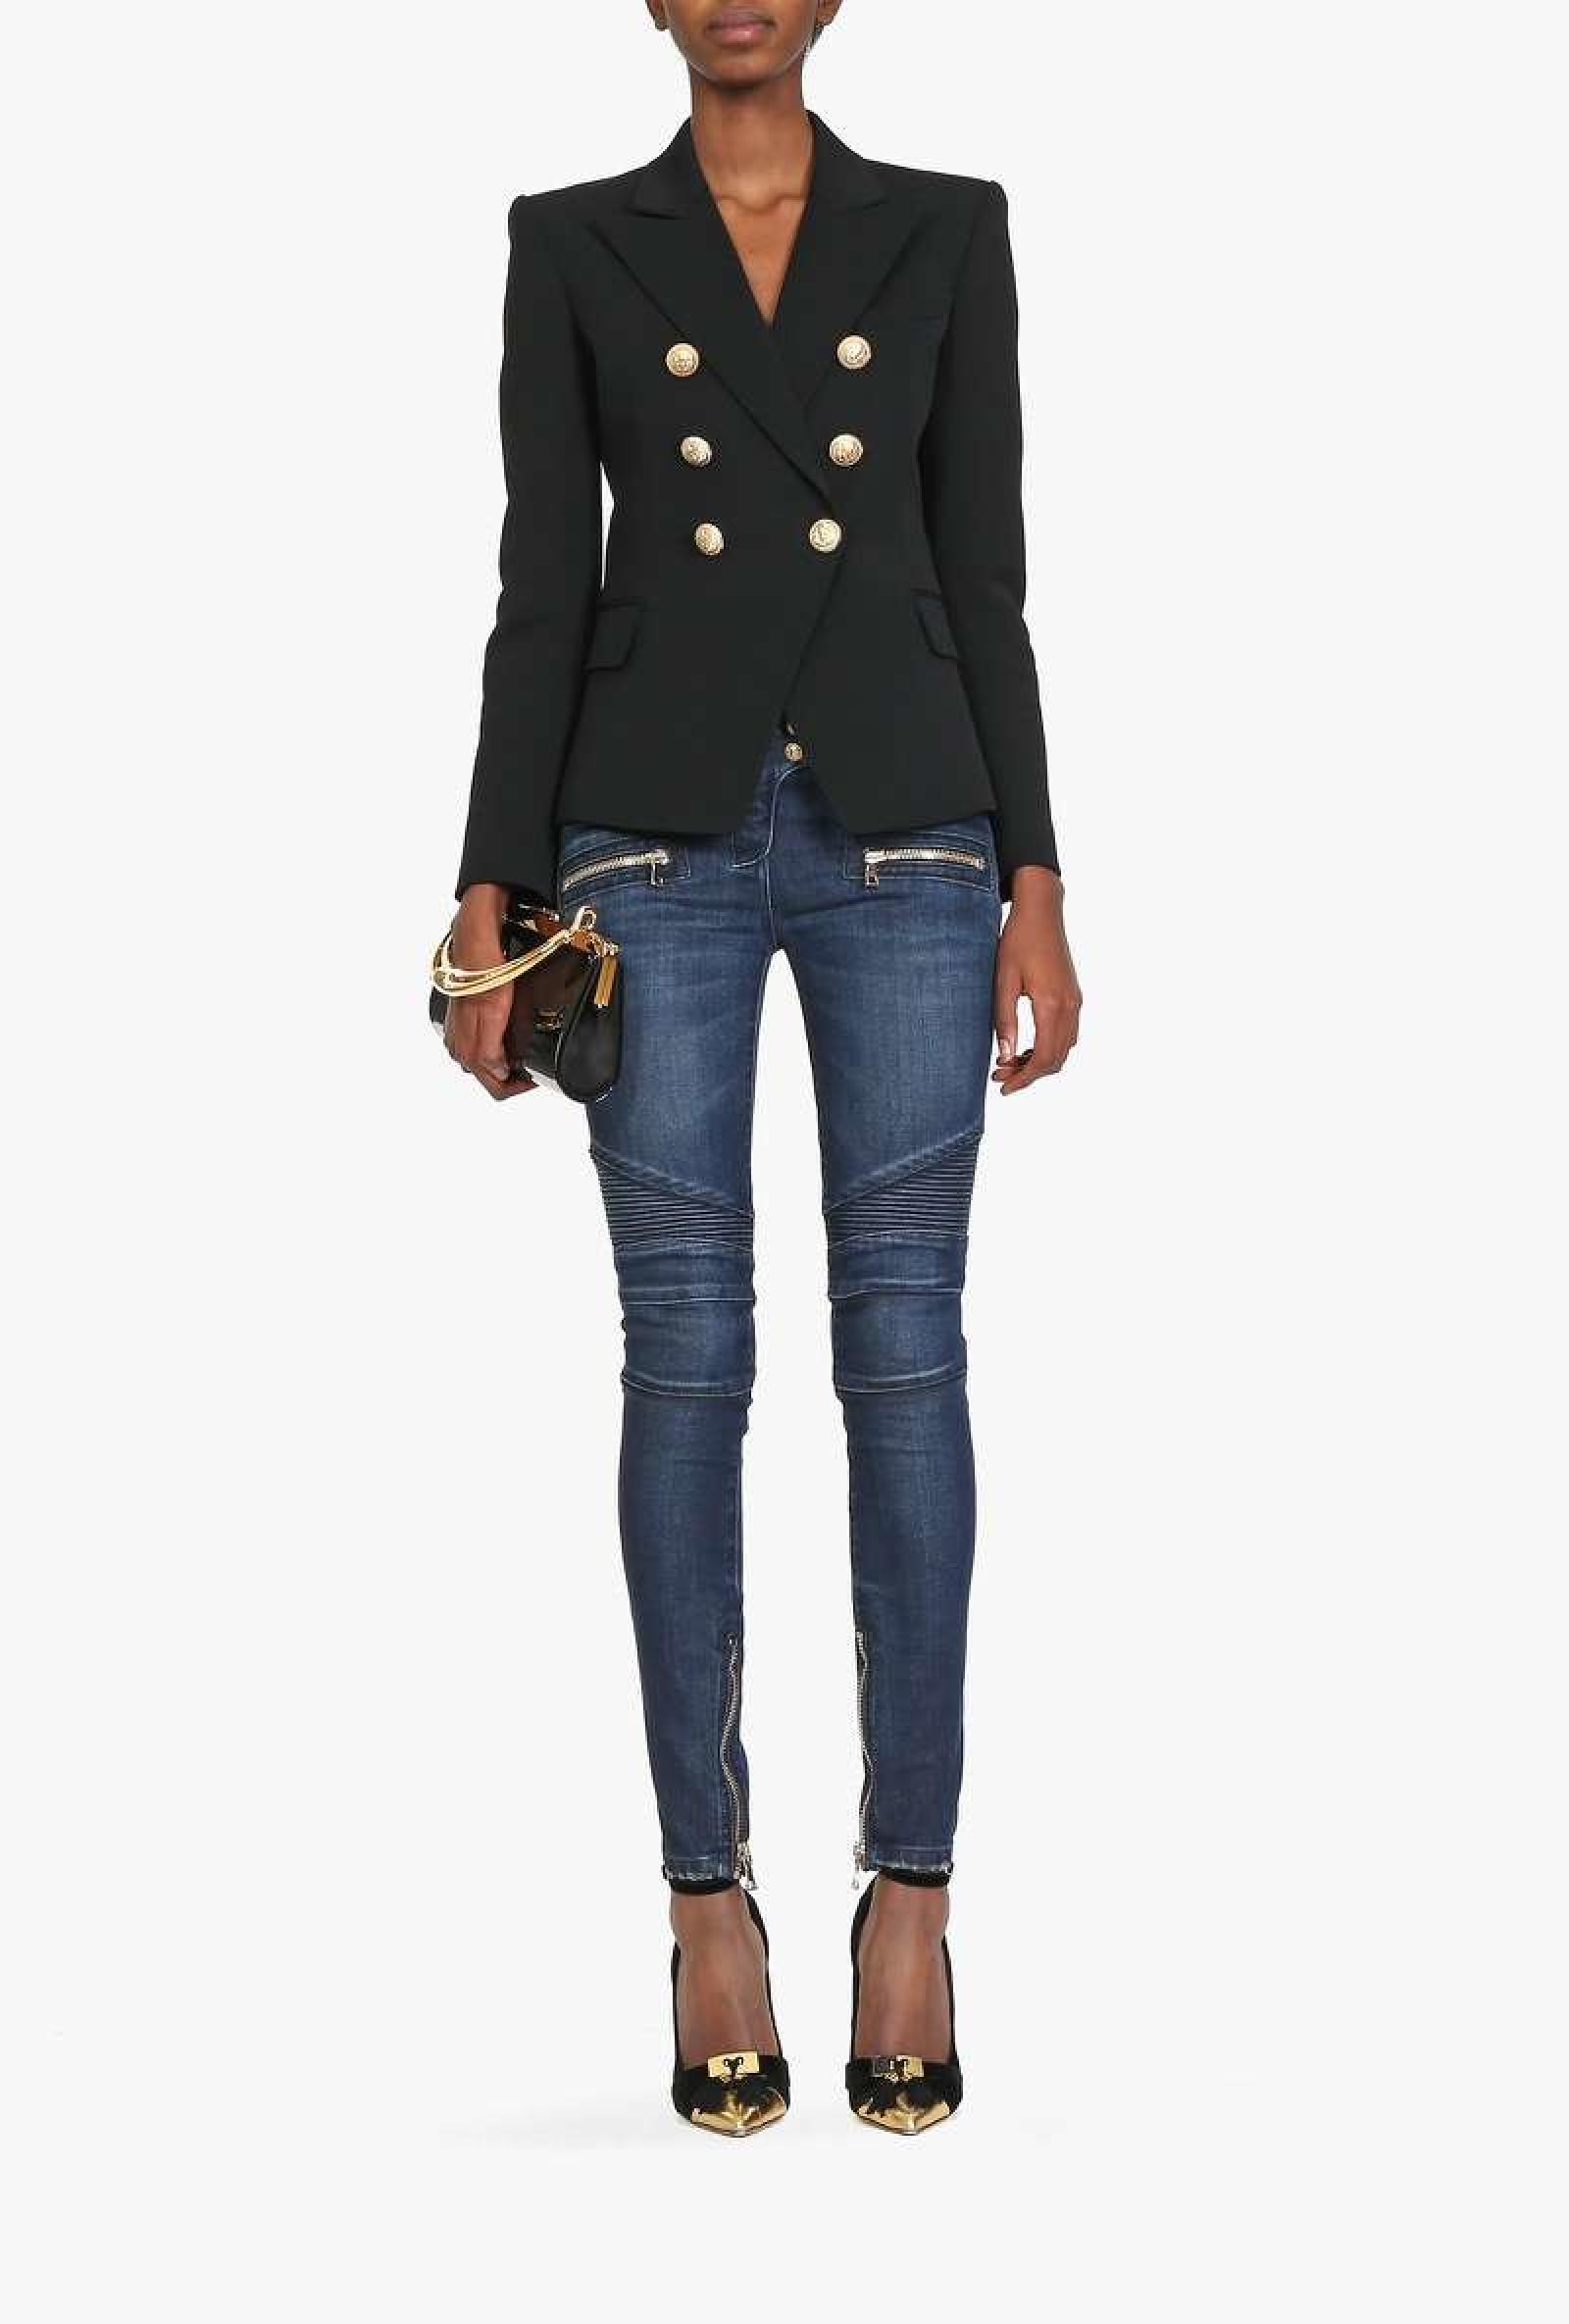 Balmain Jacket Women | Balmain Double Breasted Blazer | Balmain Size Chart